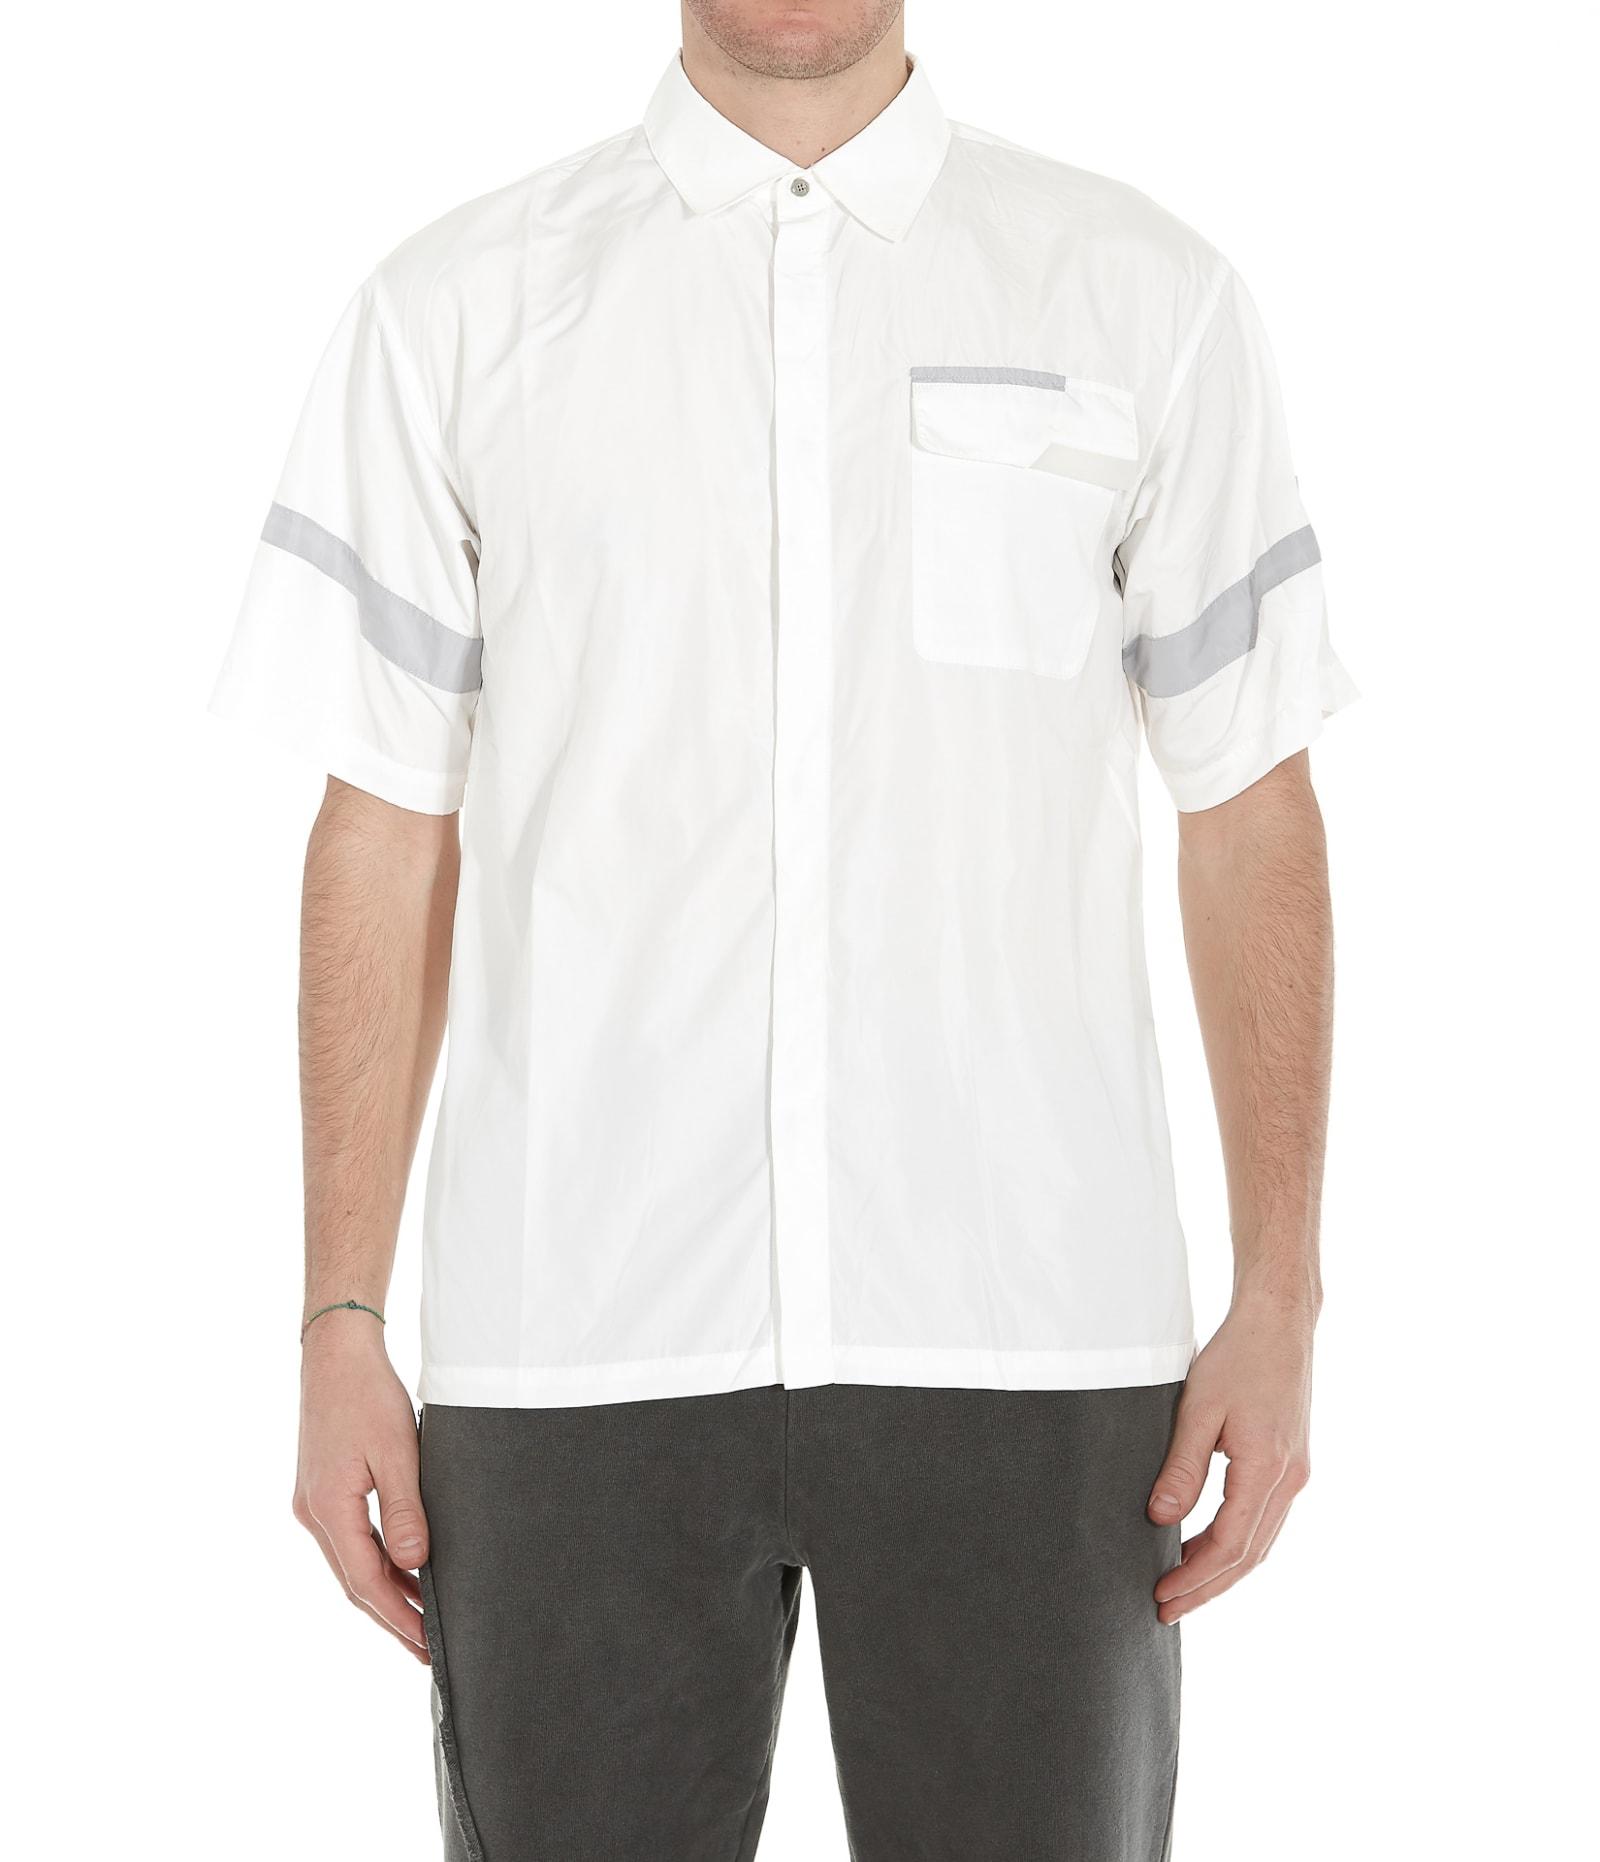 C2h4 Post Human Era Time Secret-service Panelled Short Sleeve Shirt